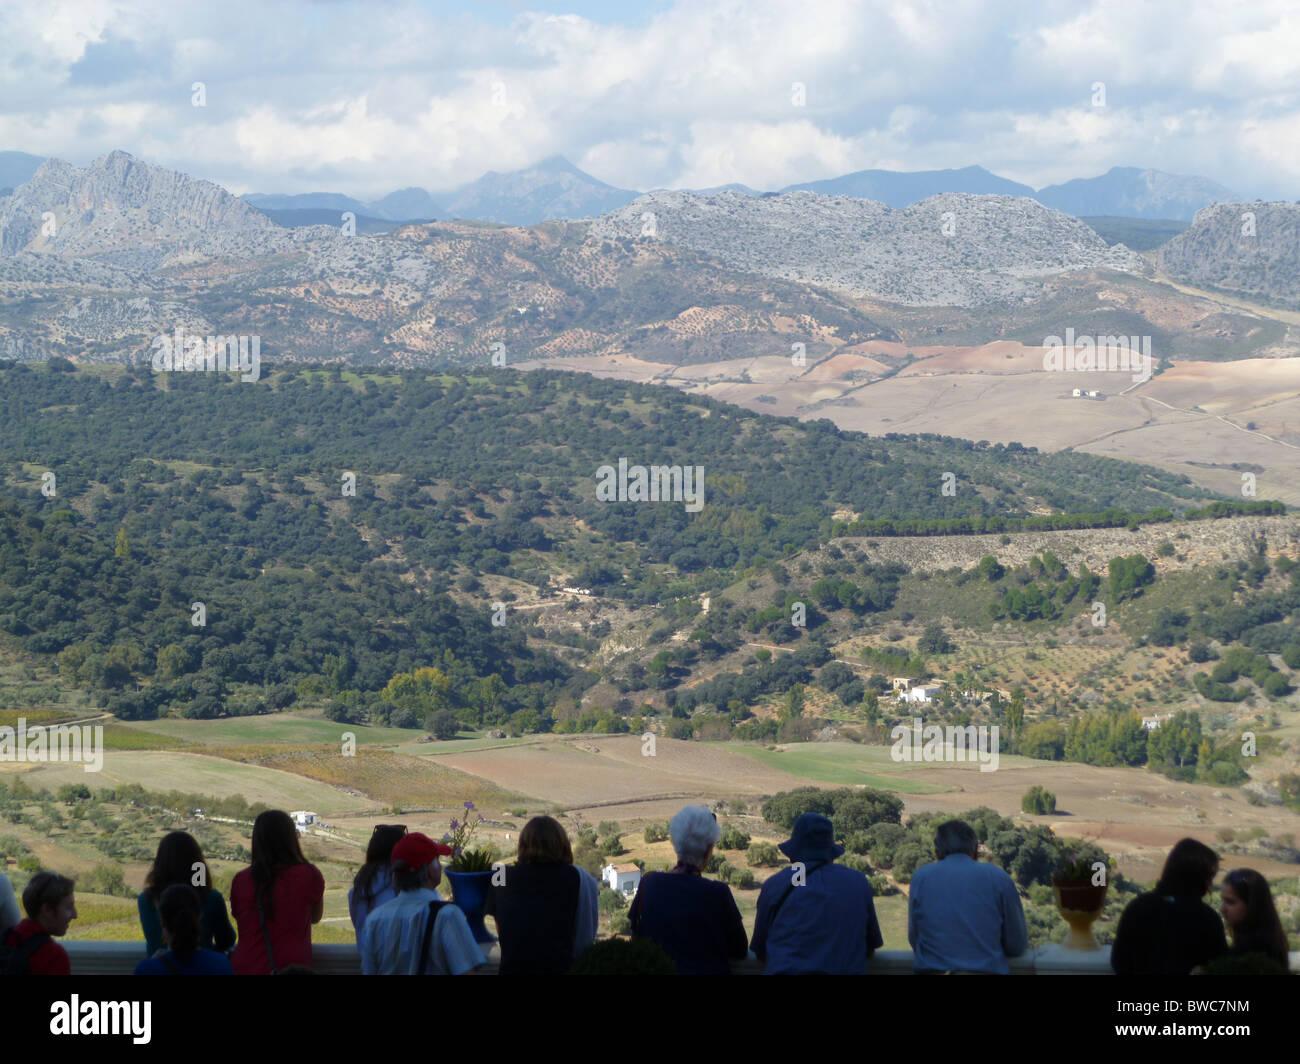 Visitors enjoying the view of the Serrania de Ronda from Casa Don Bosco in Ronda, Andalucia - Stock Image